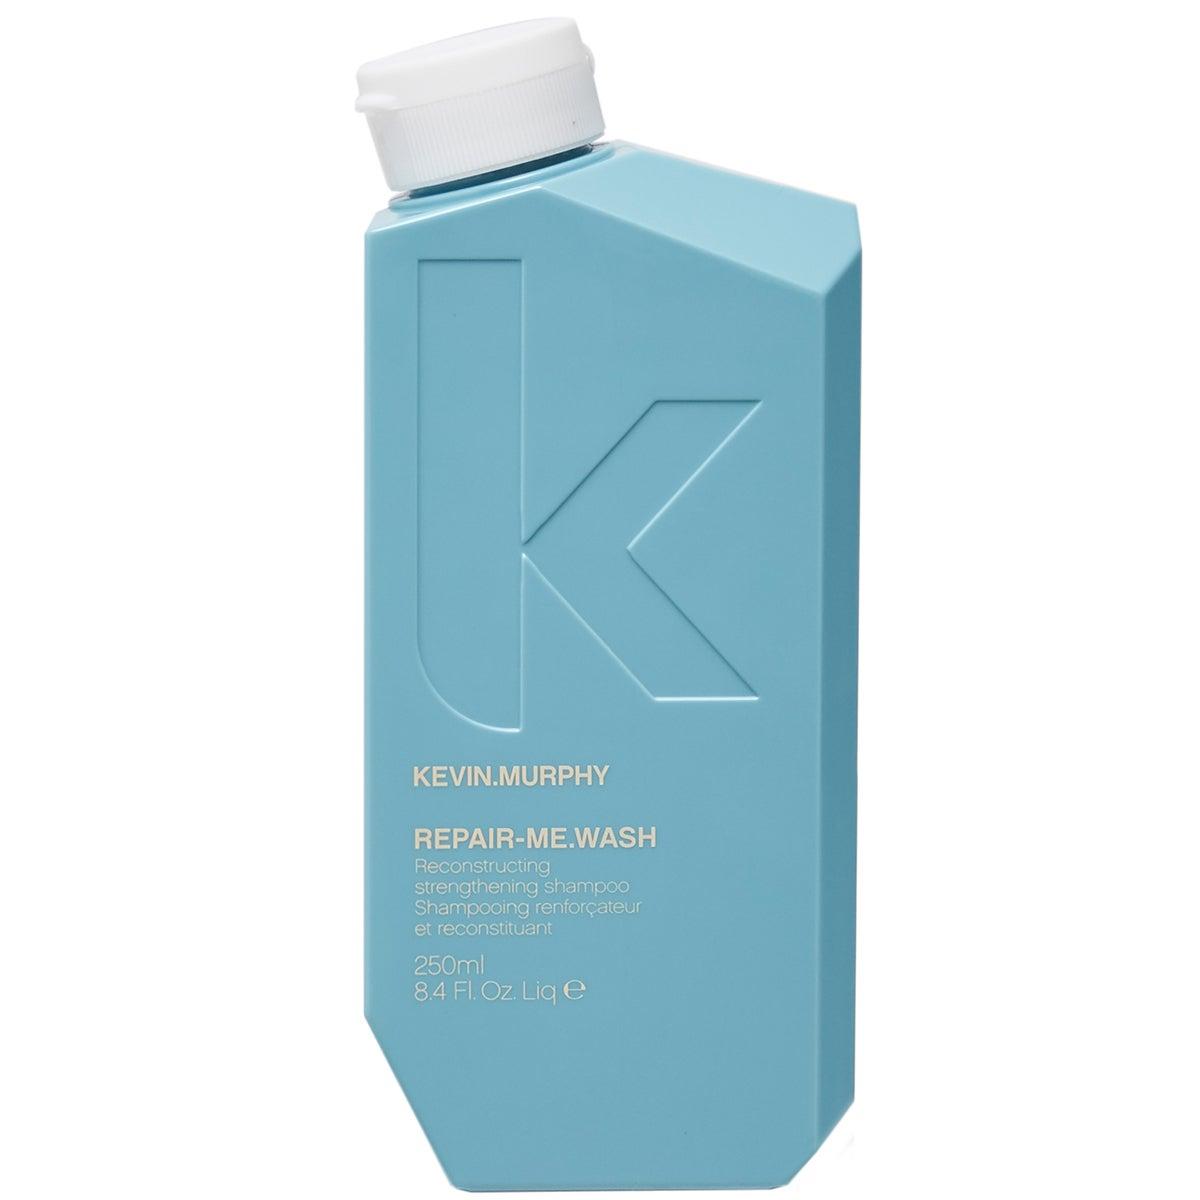 Kevin Murphy Repair-Me Wash 250 ml Kevin Murphy Schampo